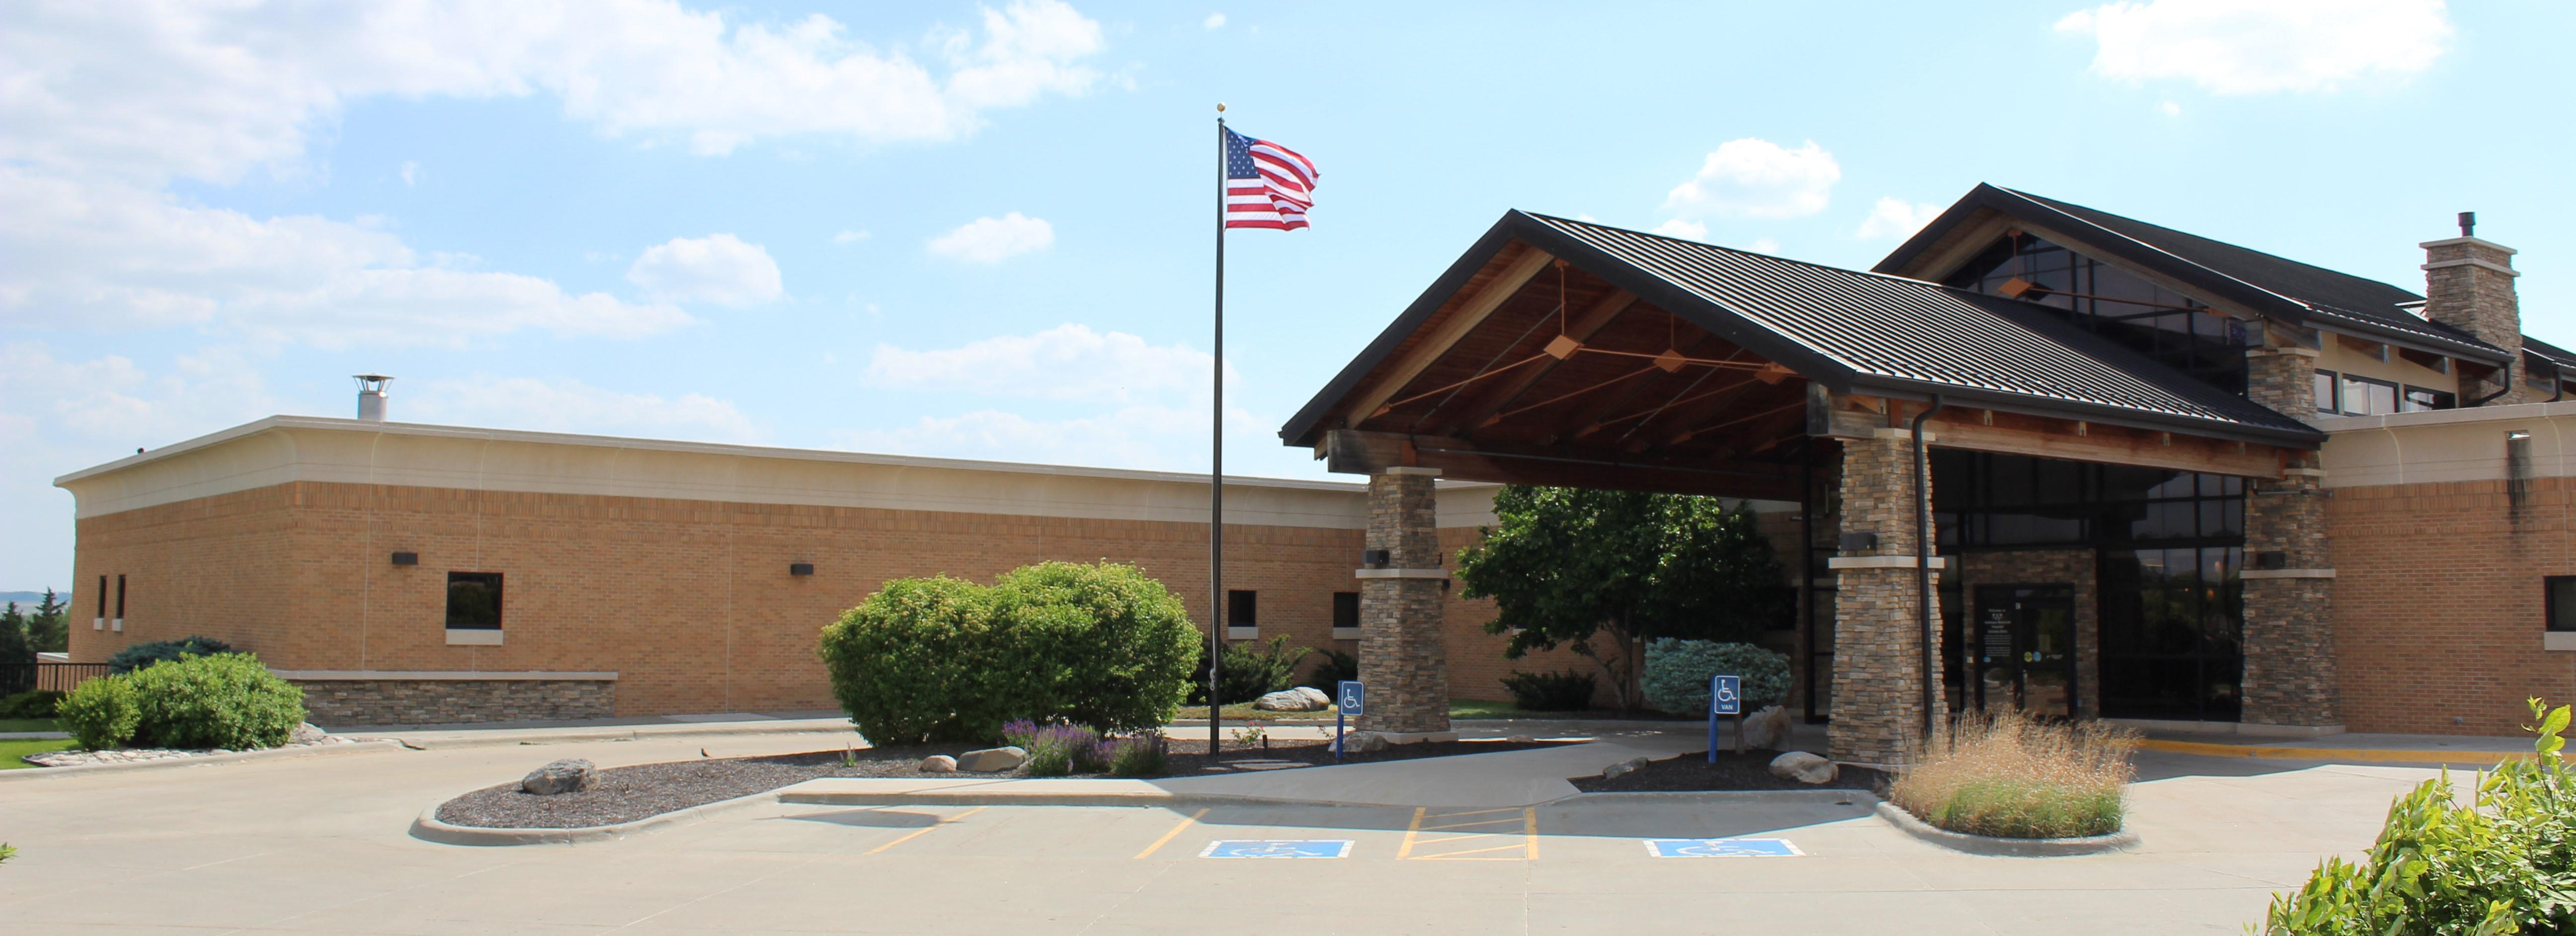 Antelope Memorial Hospital front entrance